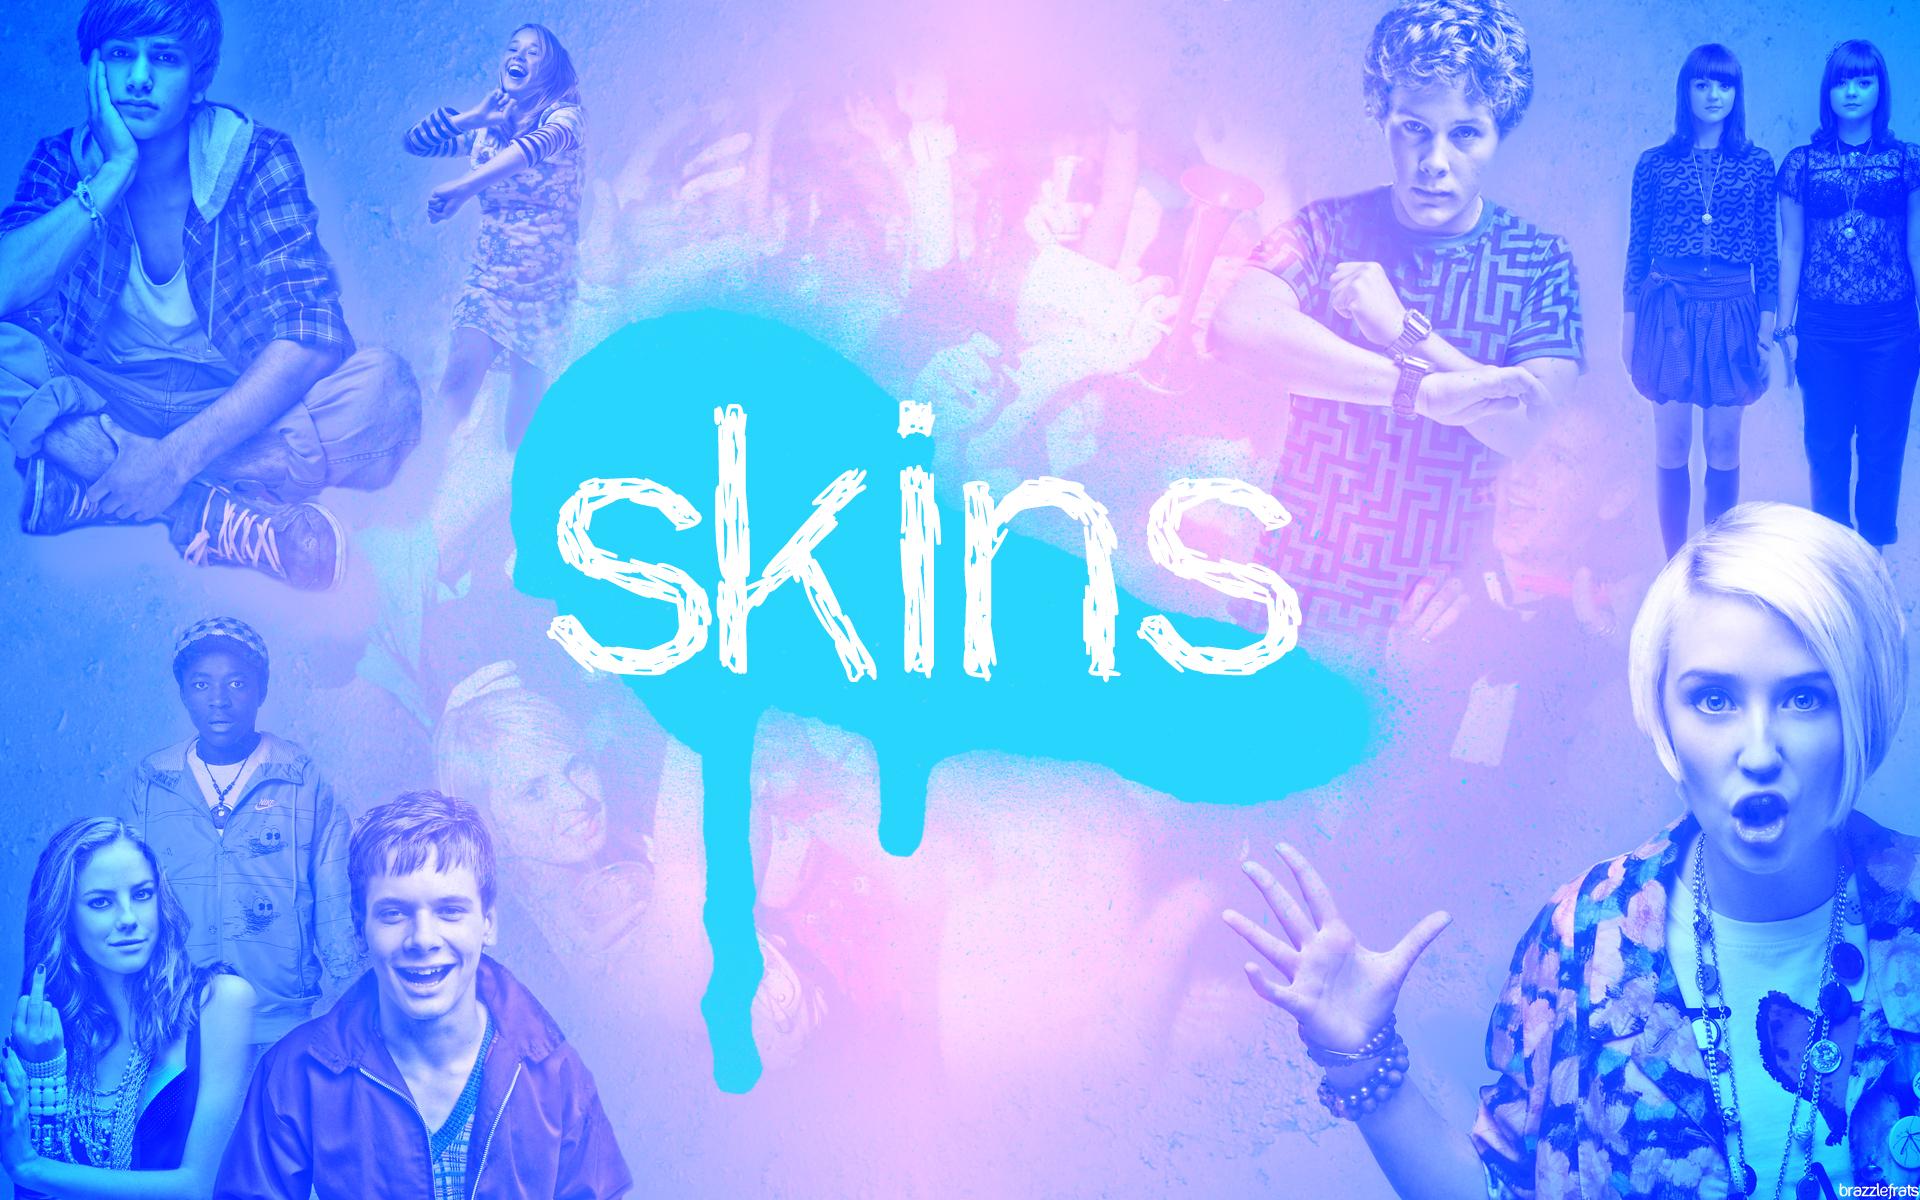 skins - photo #31